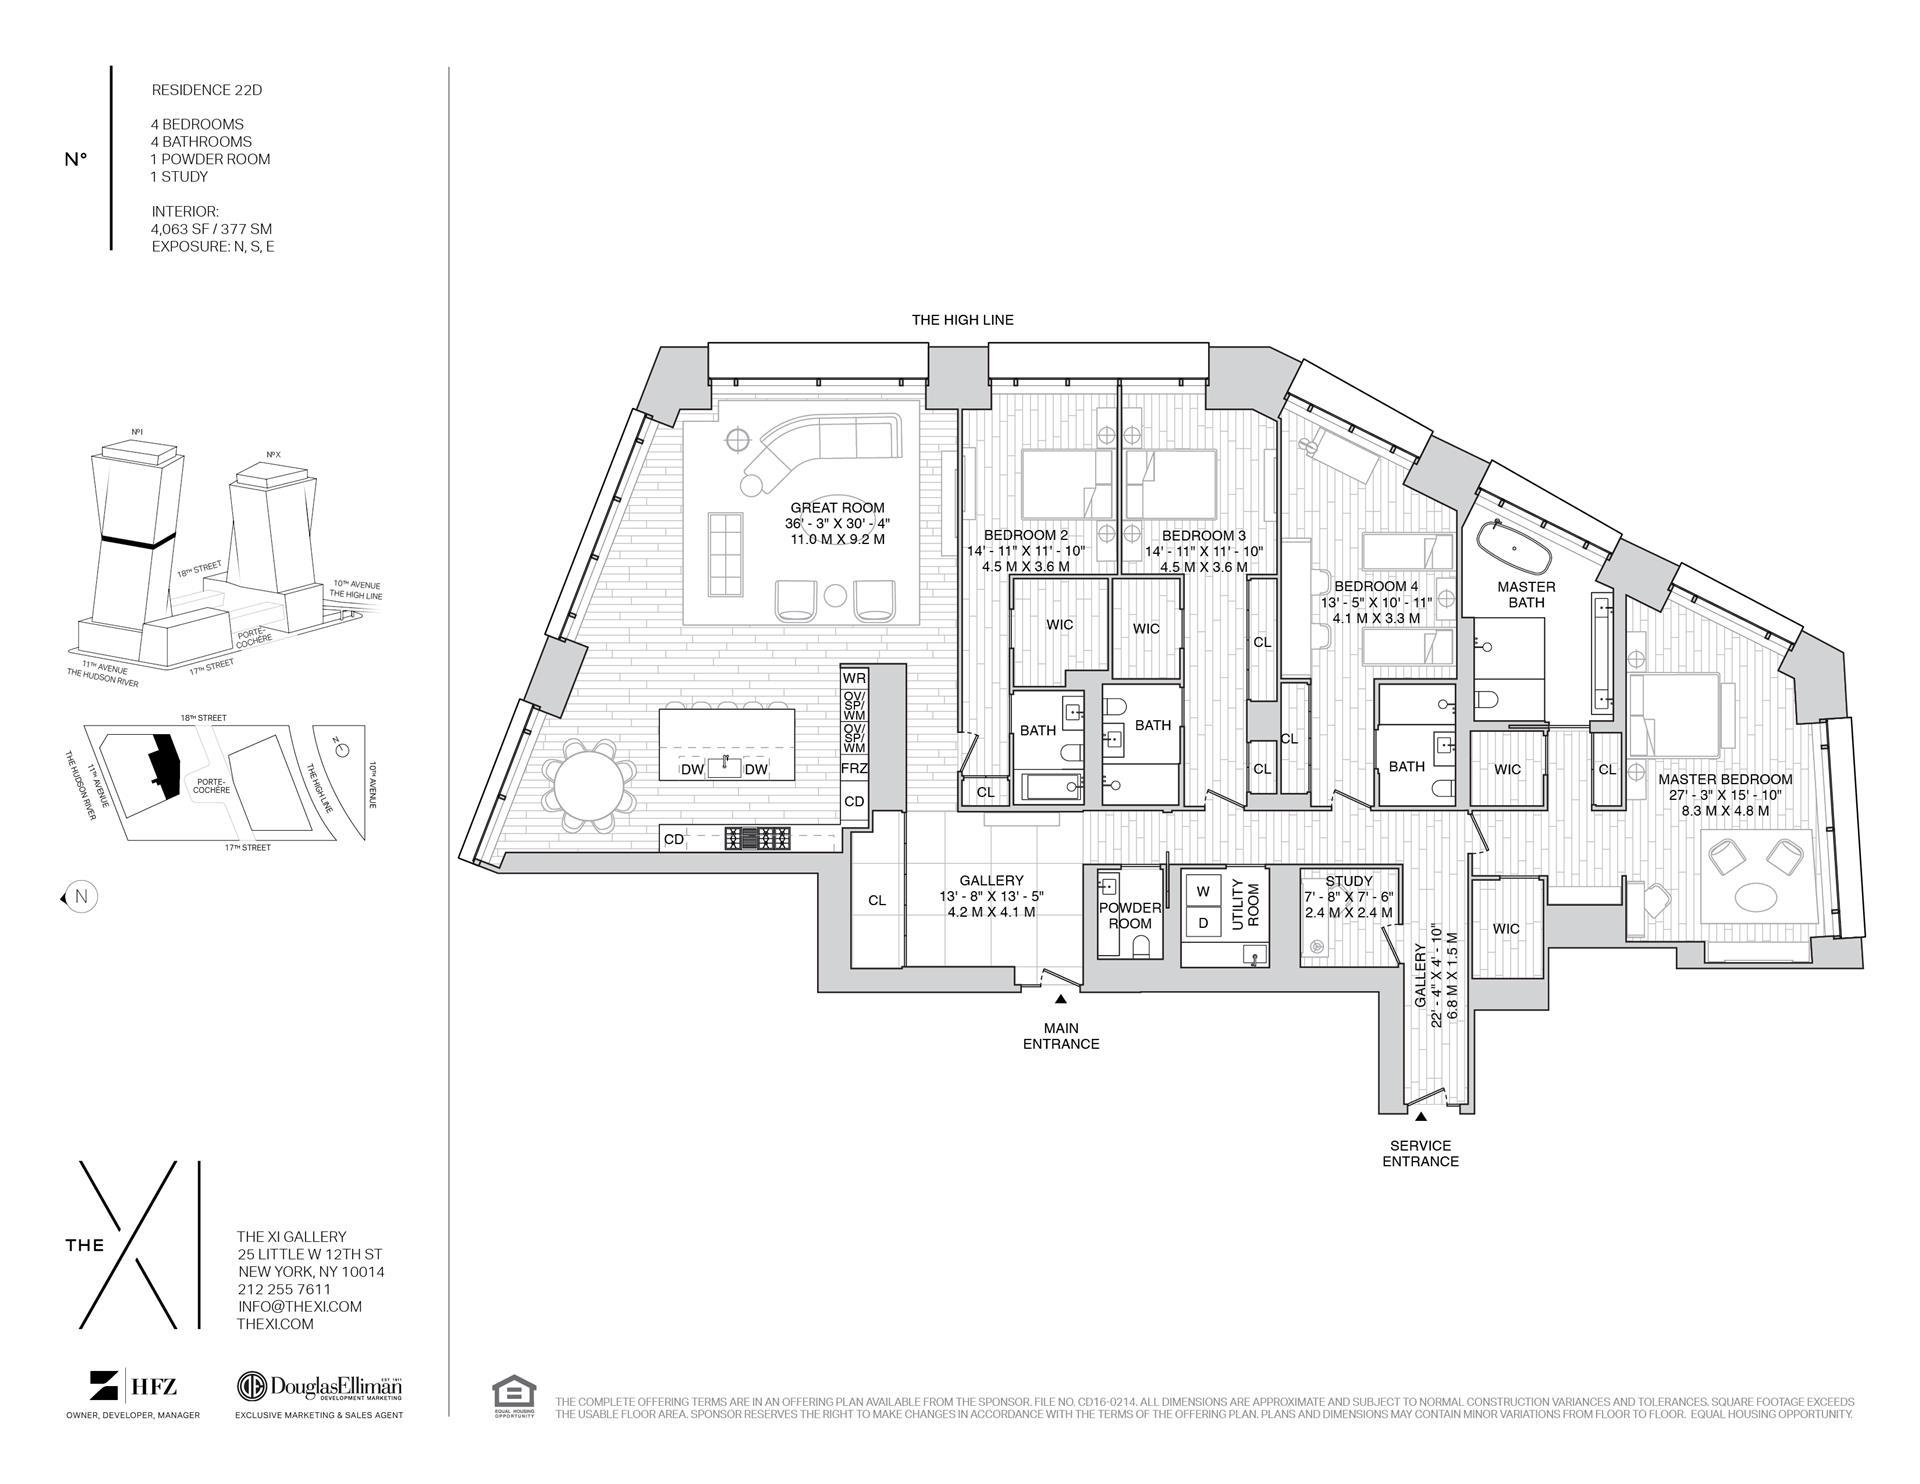 Floor plan of The XI, 76 Eleventh Avenue, 22D - Chelsea, New York